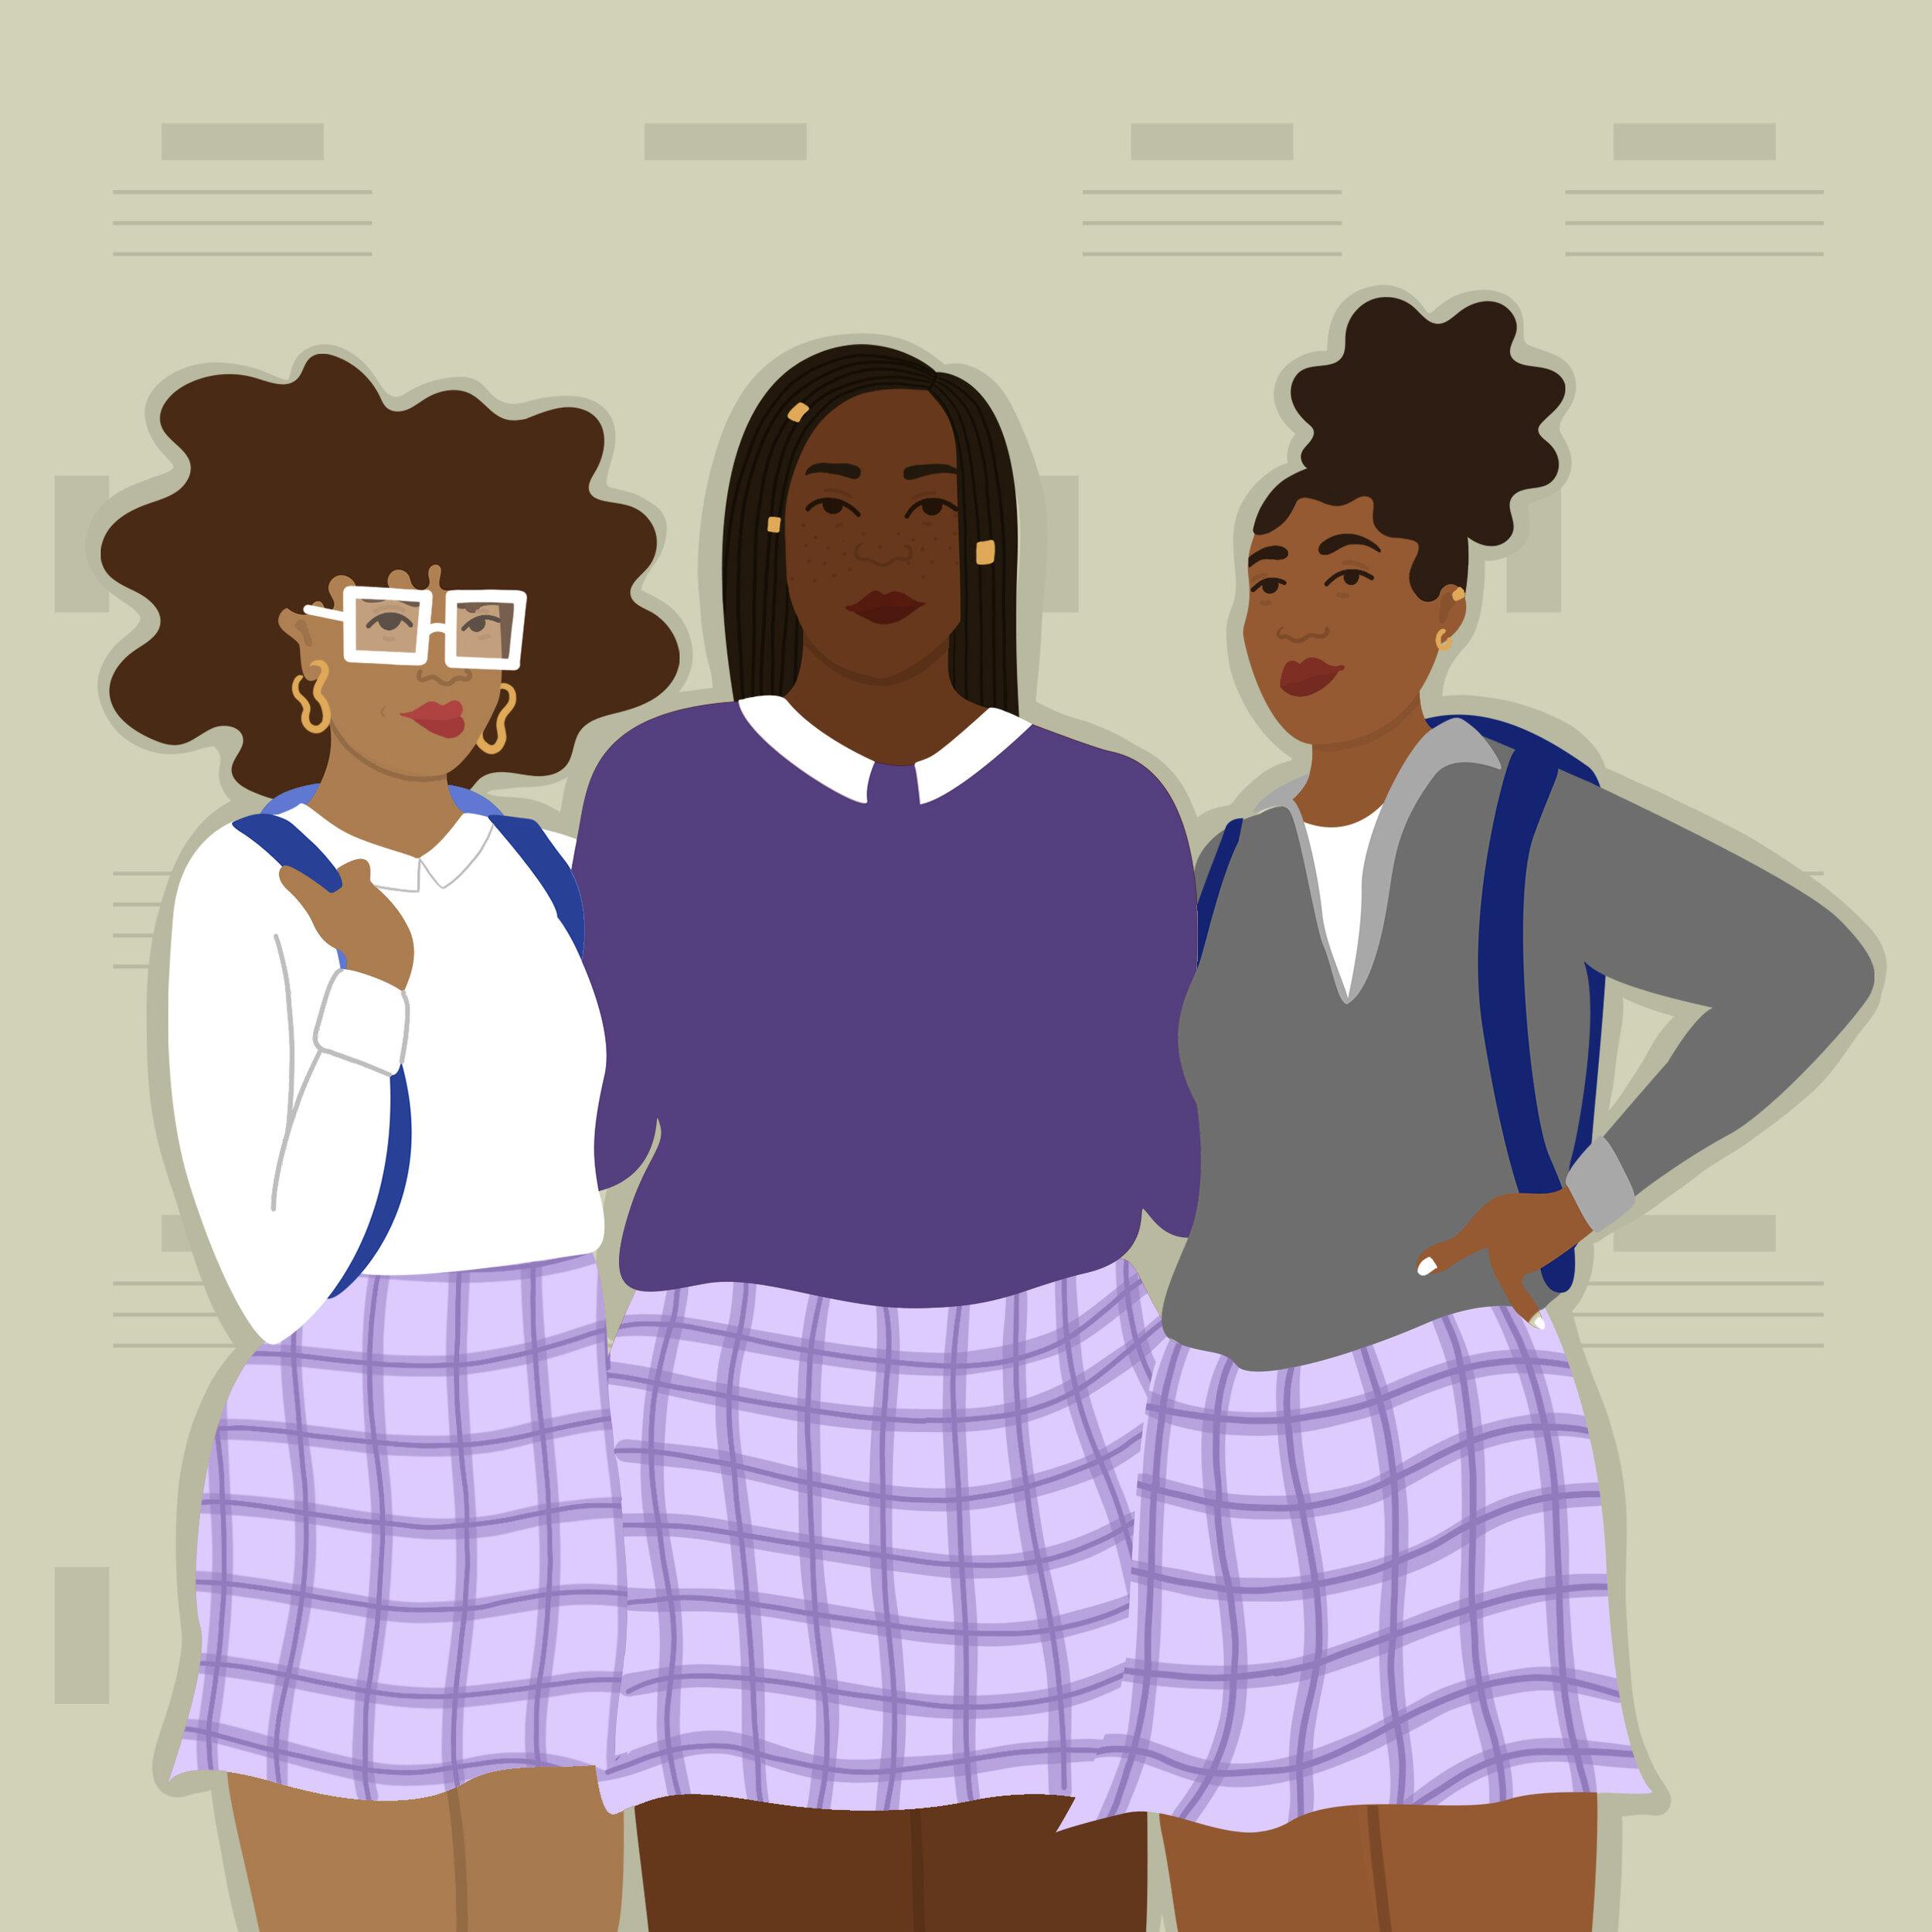 Three Black characters in purple school uniforms standing in front of lockers.